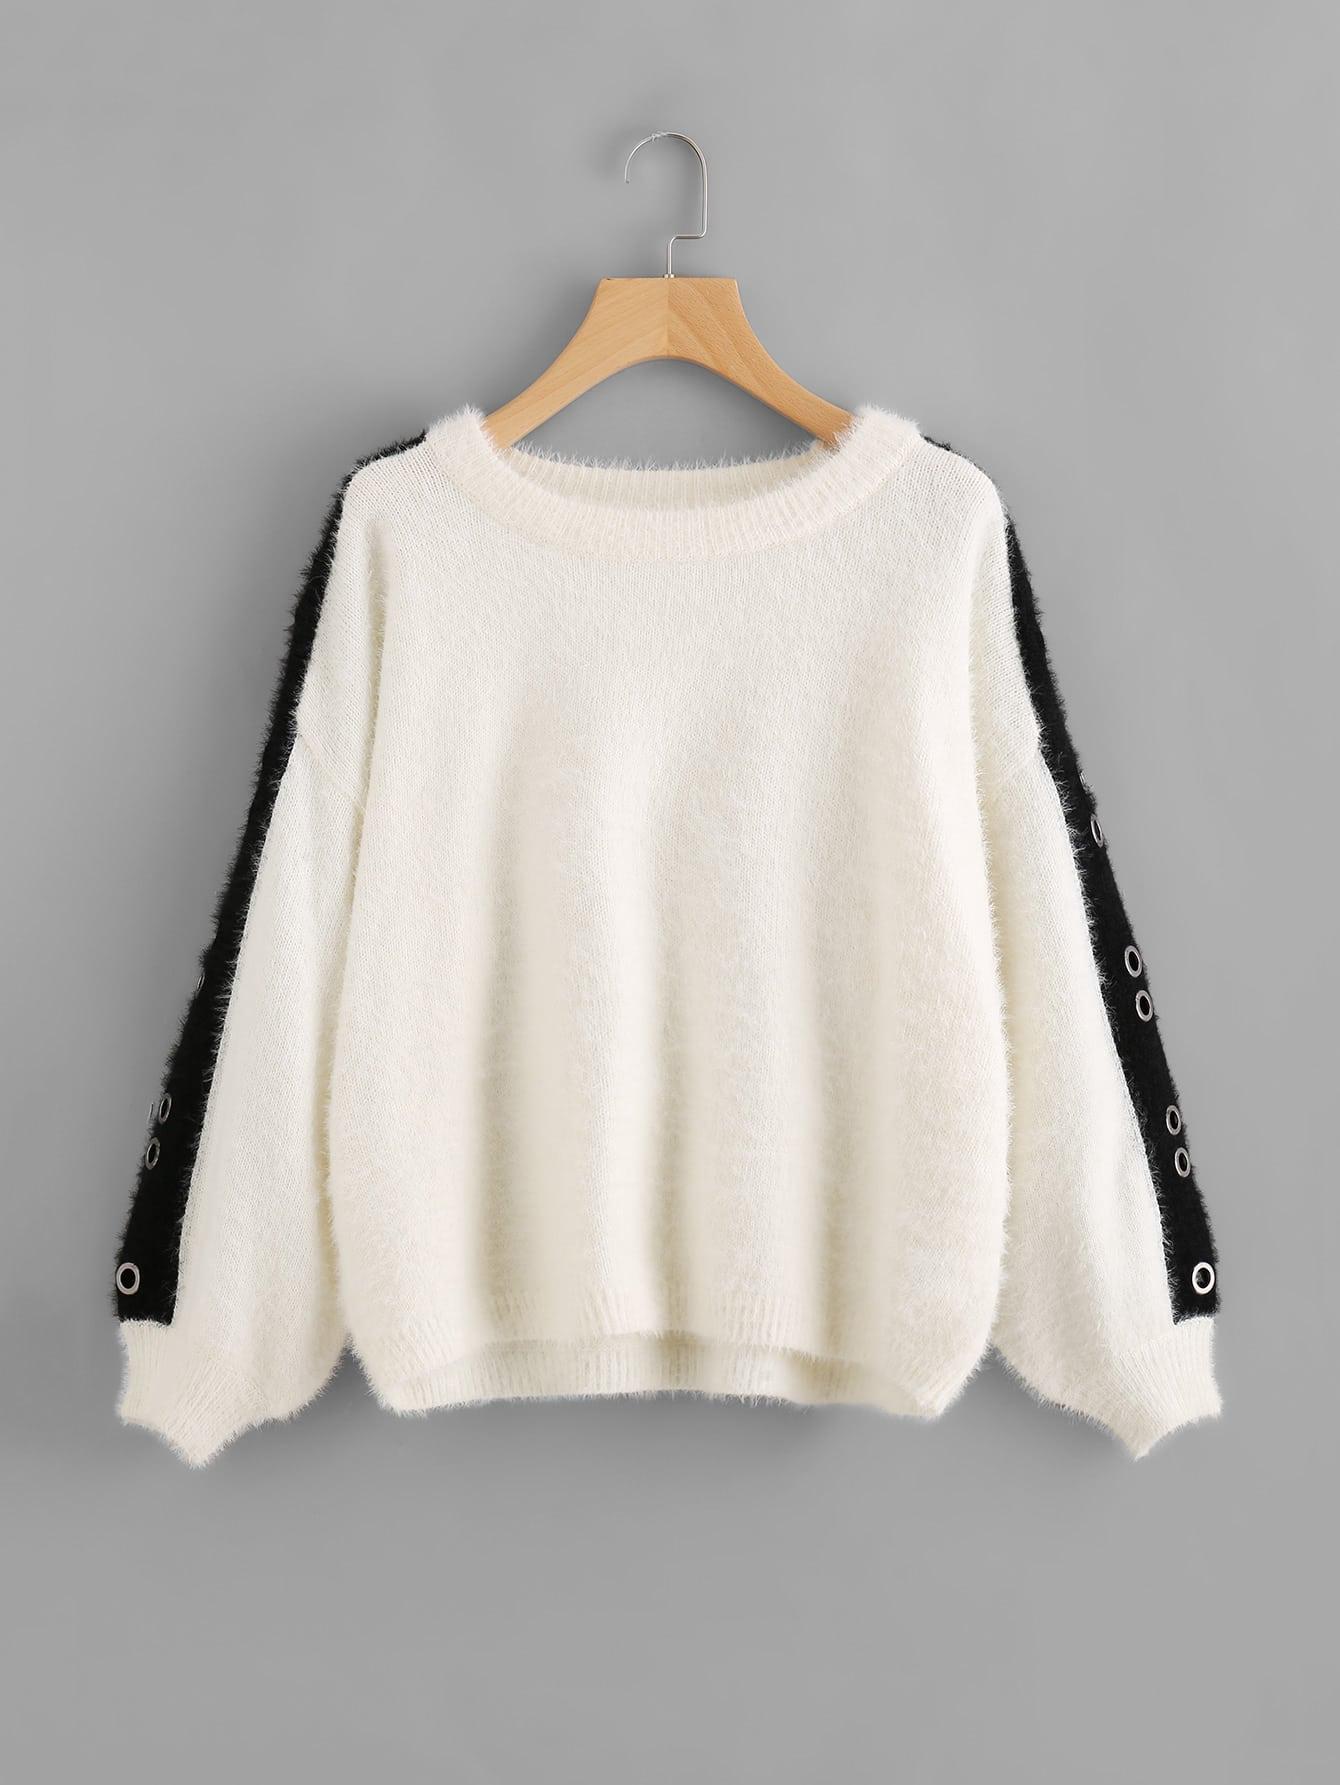 Grommet Detail Contrast Panel Fuzzy Jumper sweater170710466